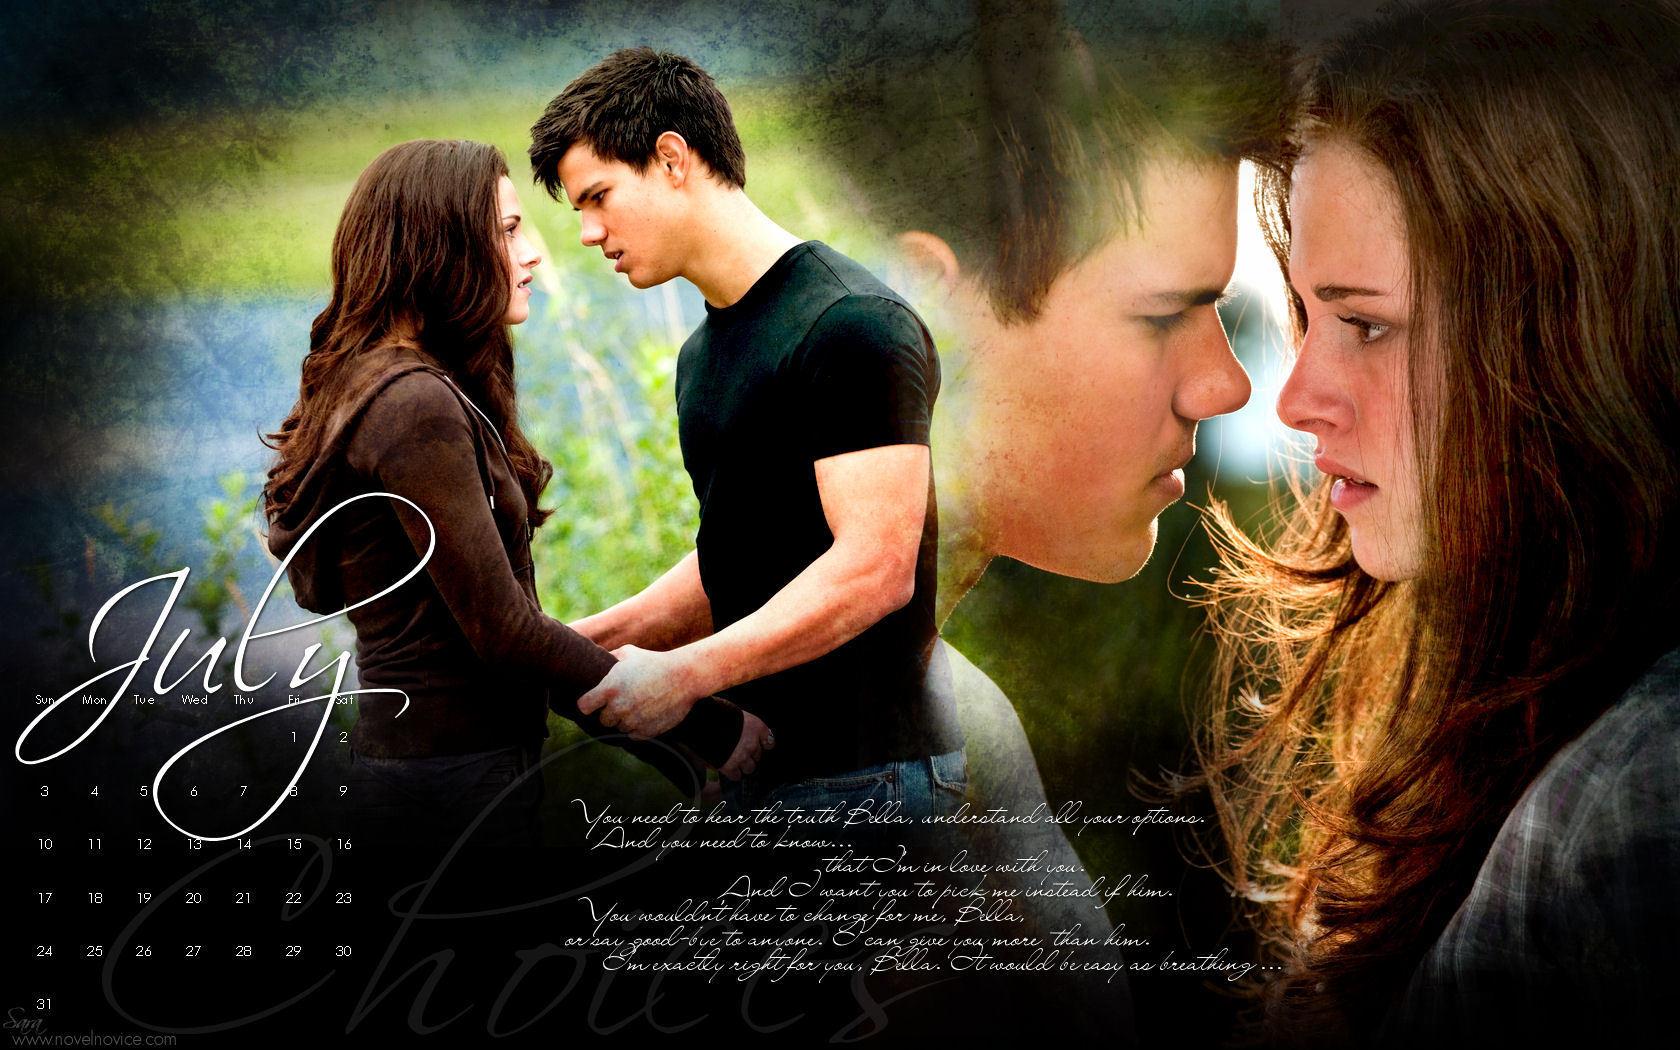 The Twilight Saga Eclipse Movie Wallpapers Wallpapersink Twilight